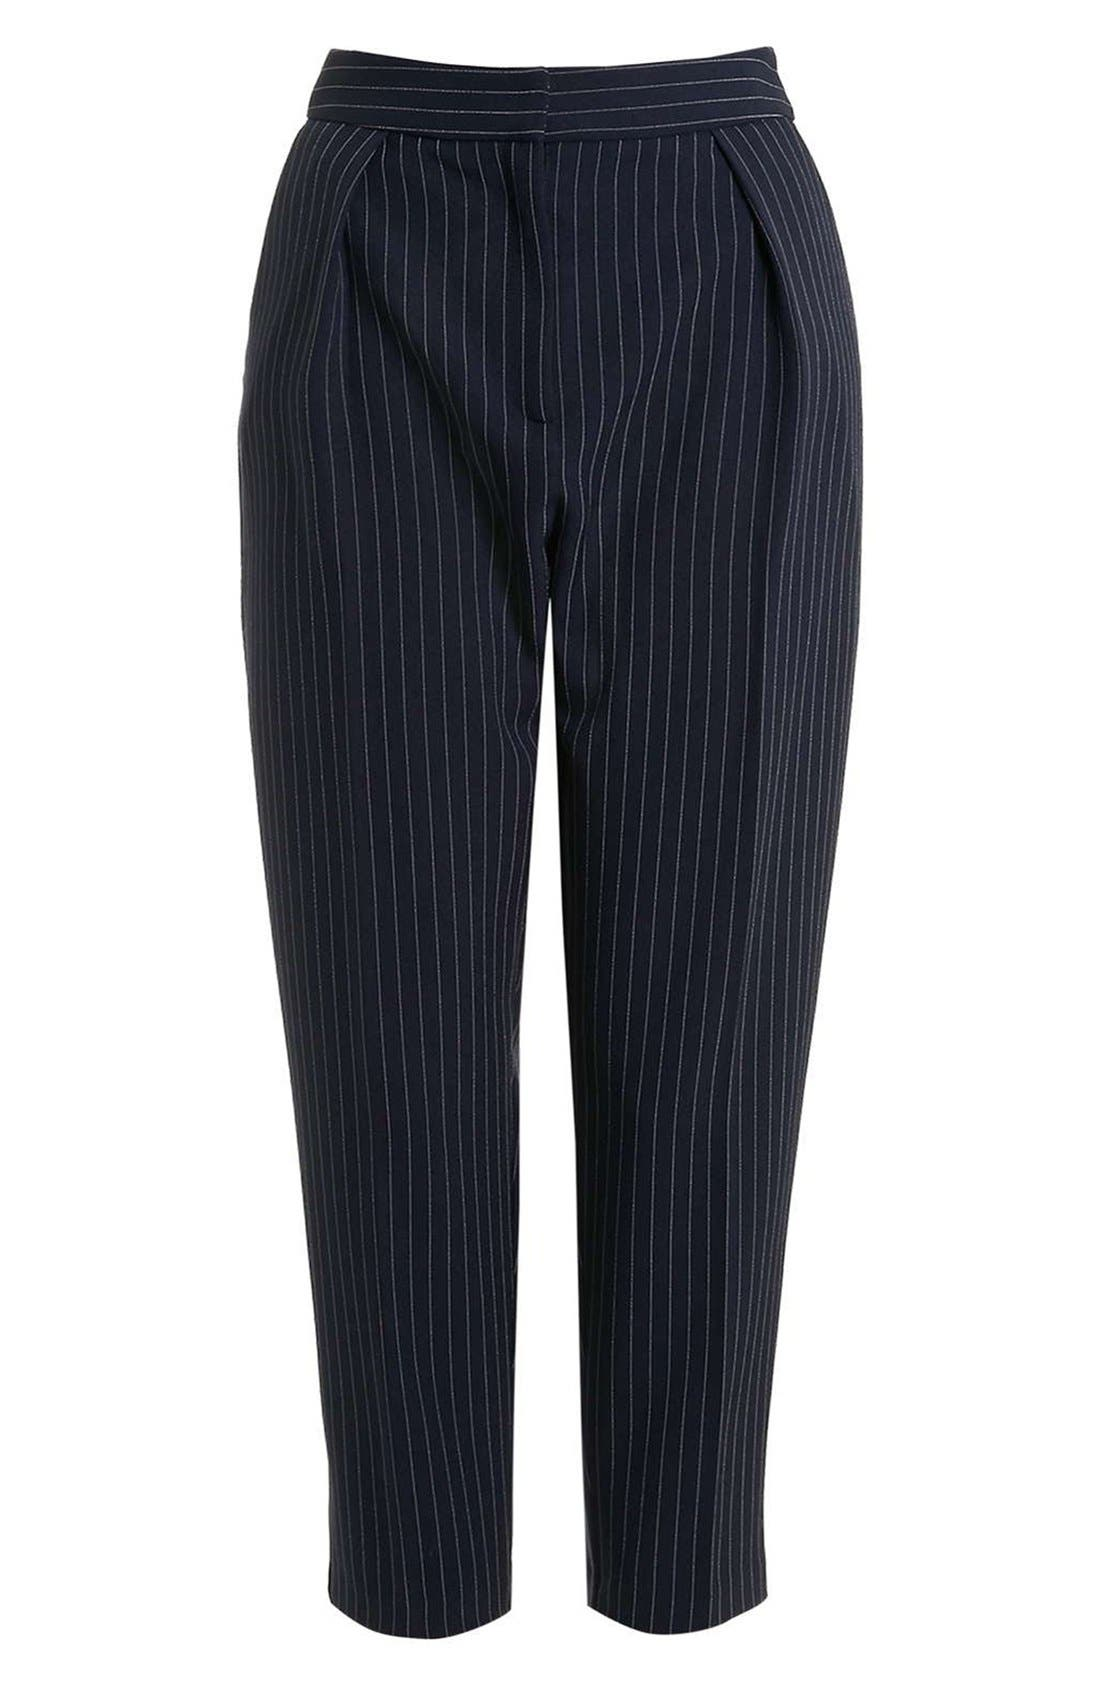 Alternate Image 4  - Topshop Pinstripe Crop Trousers (Petite)